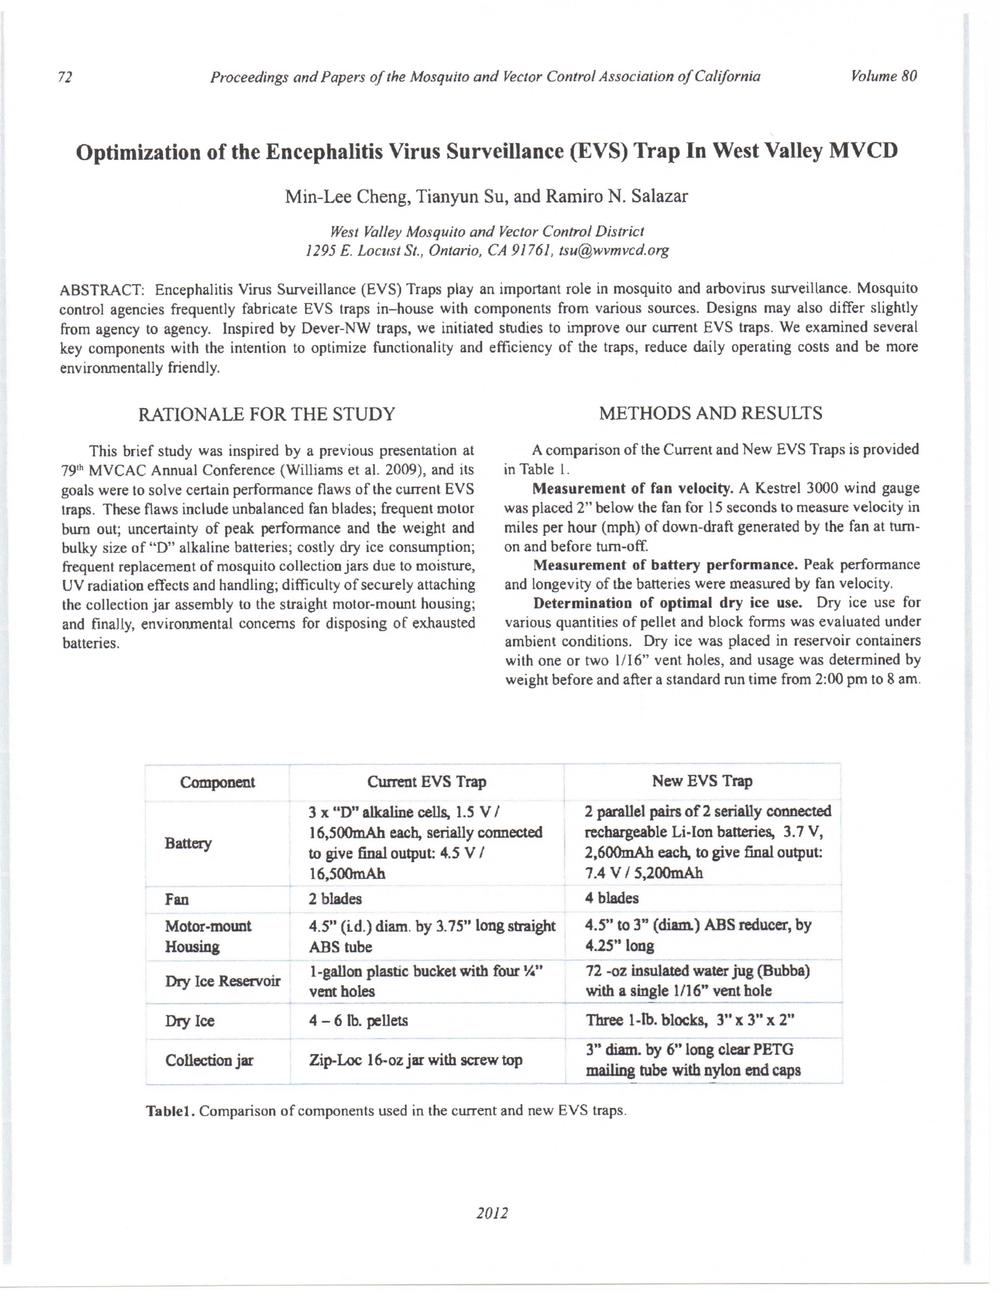 EVS Trap modification-MVCAC Vol. 80 PP 72-73_Page_1.png